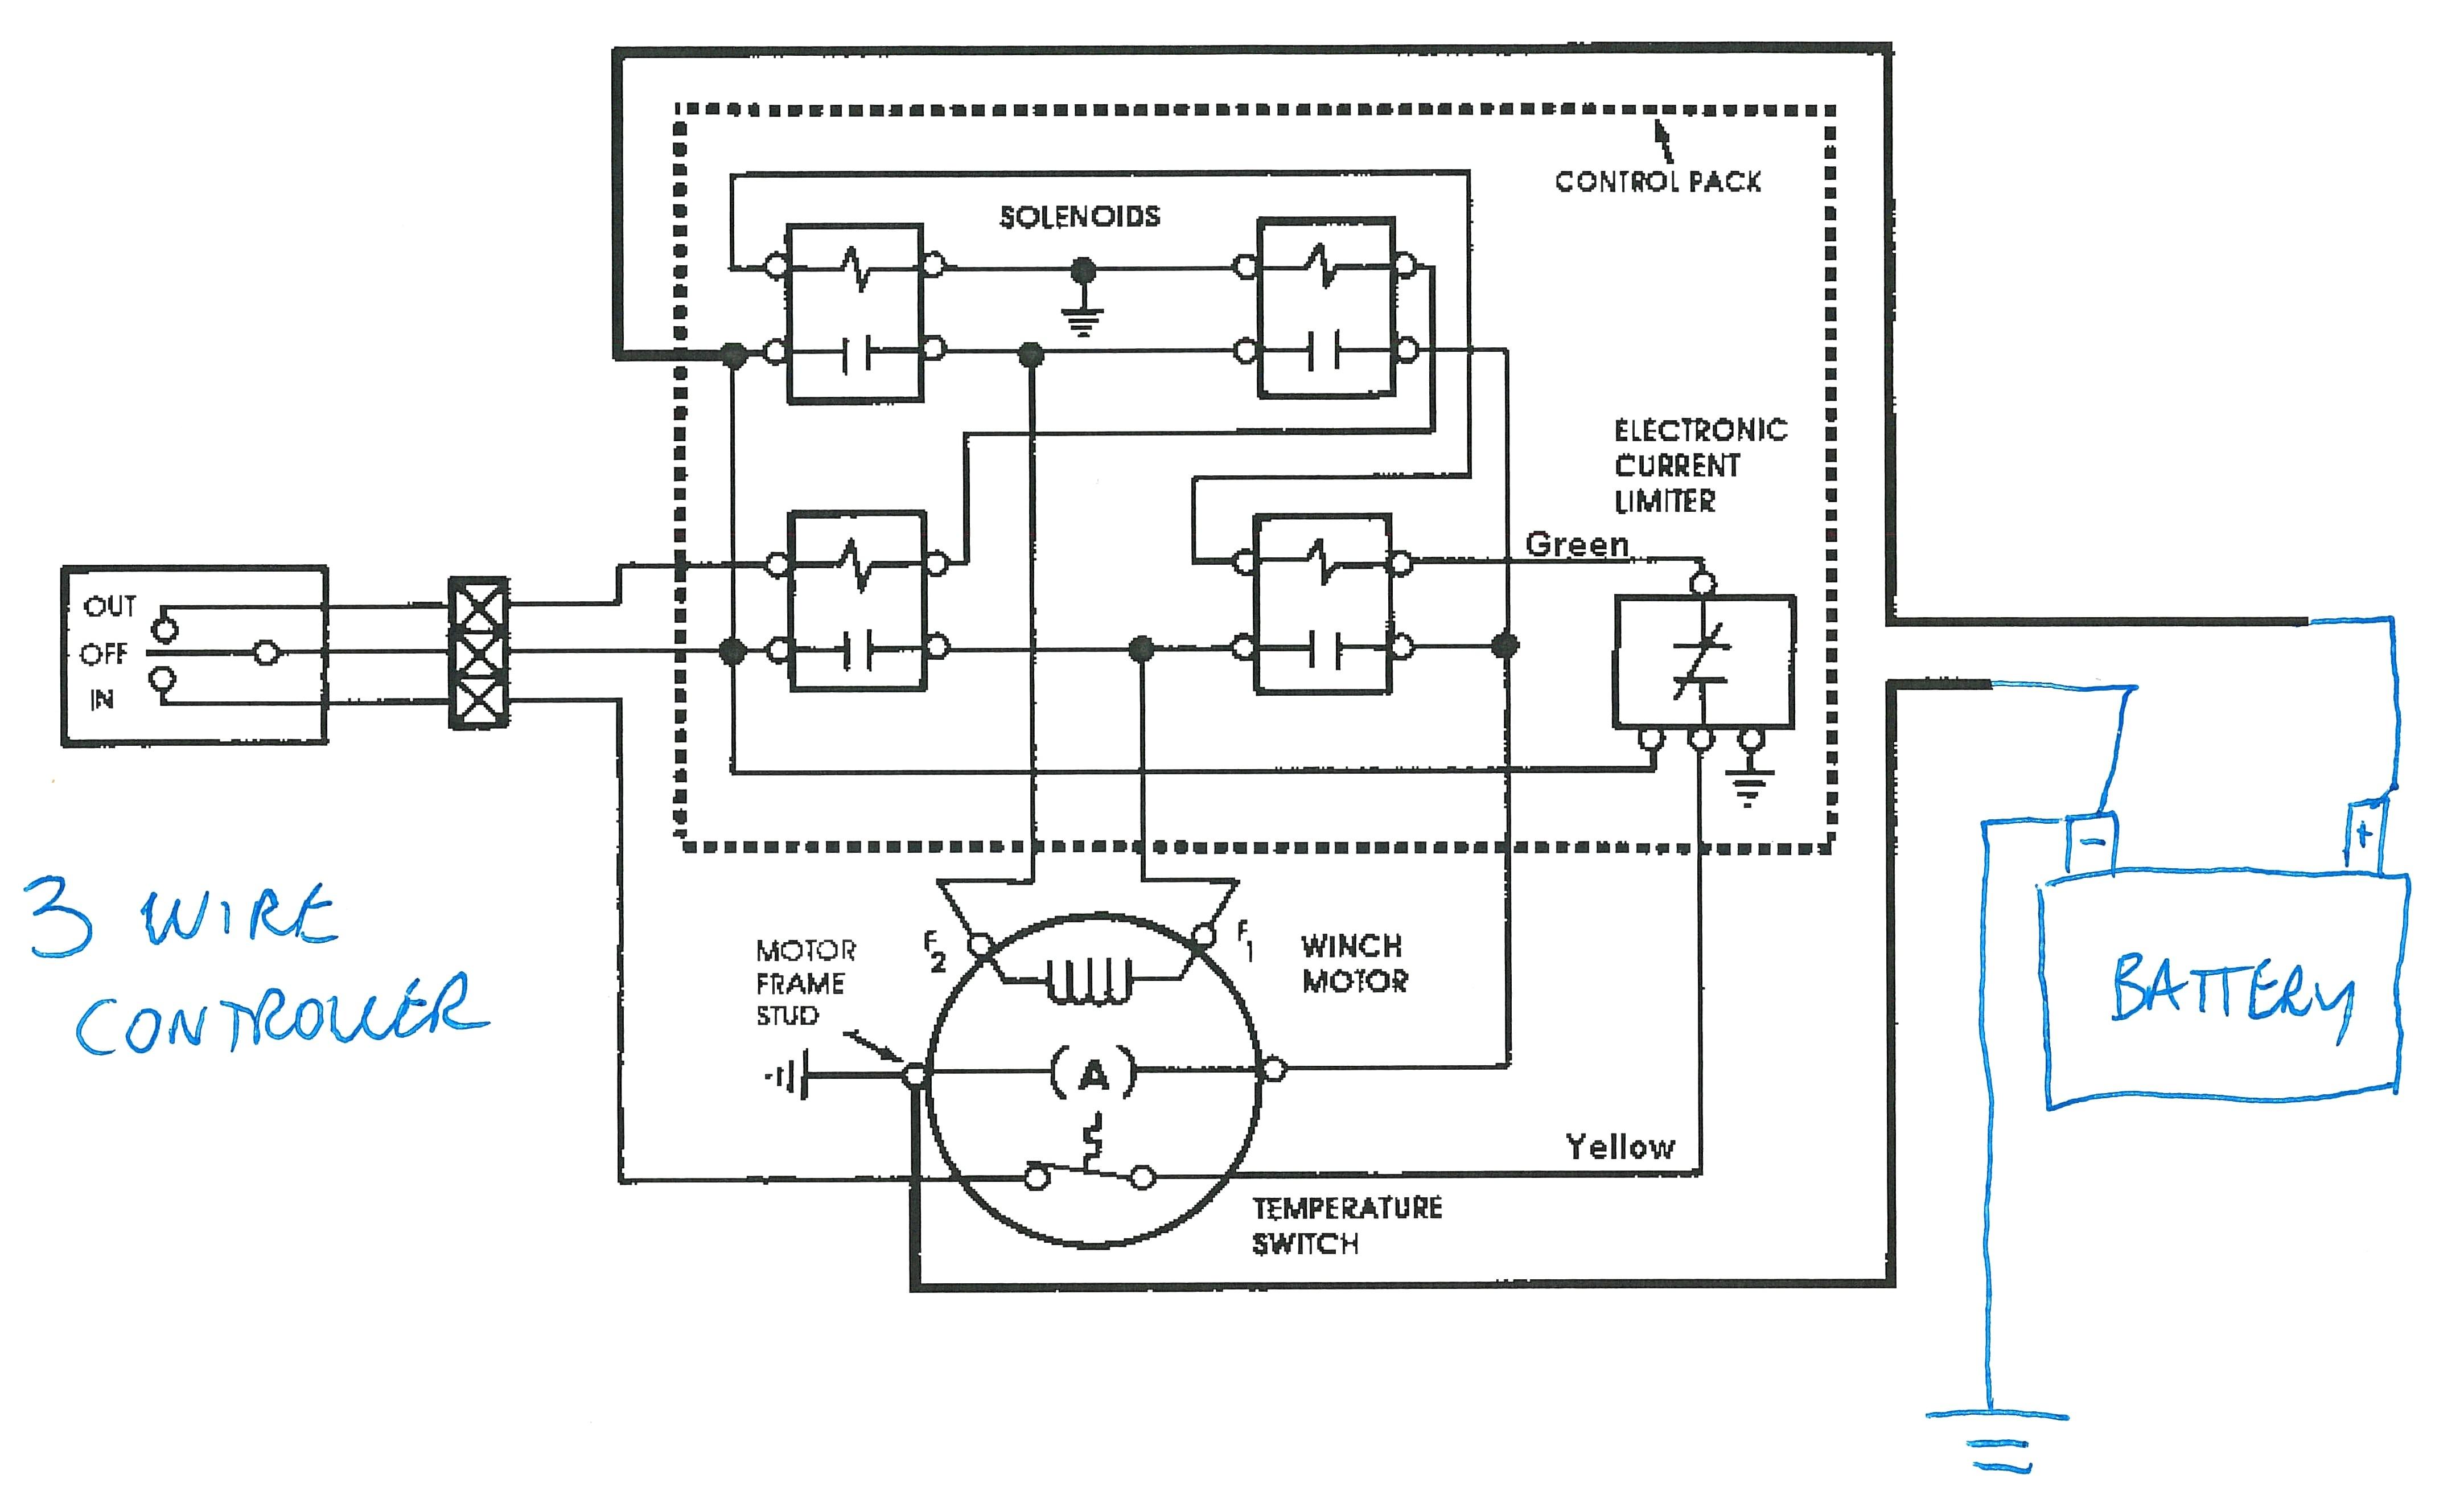 Warn M8000 Wiring Diagram New